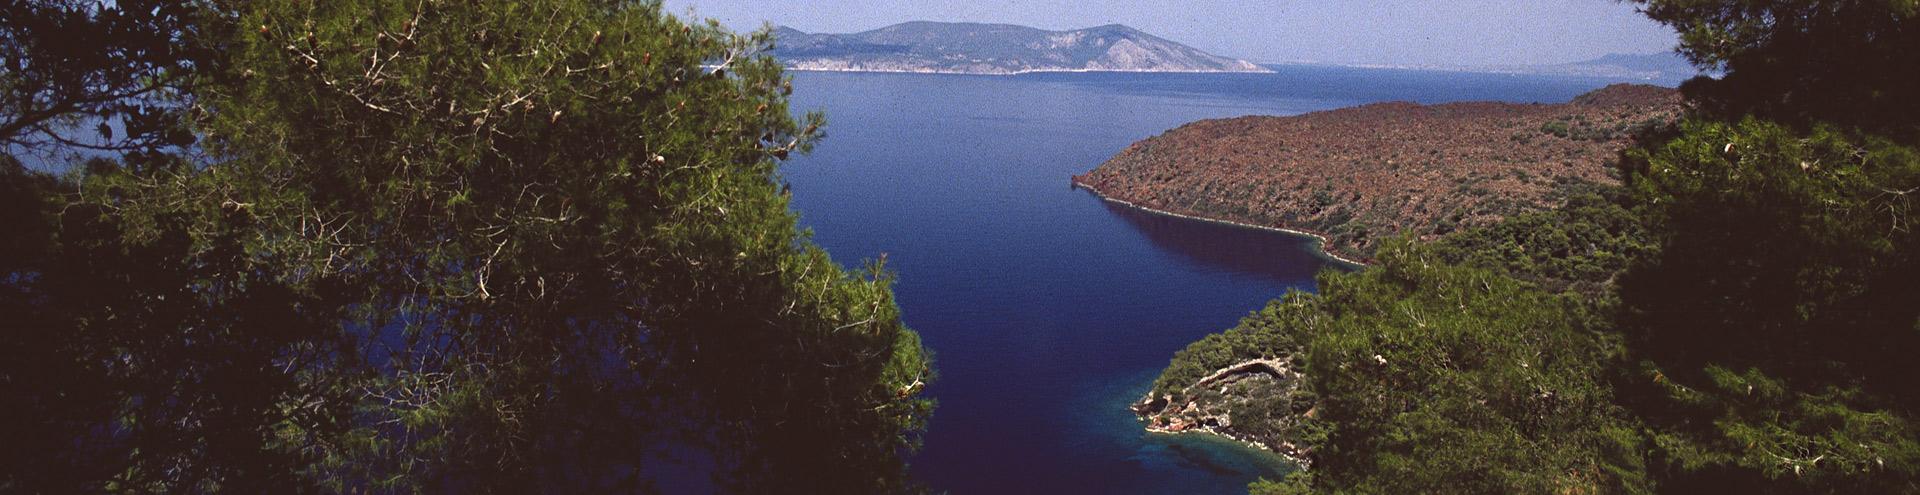 Agios Andreas volcano